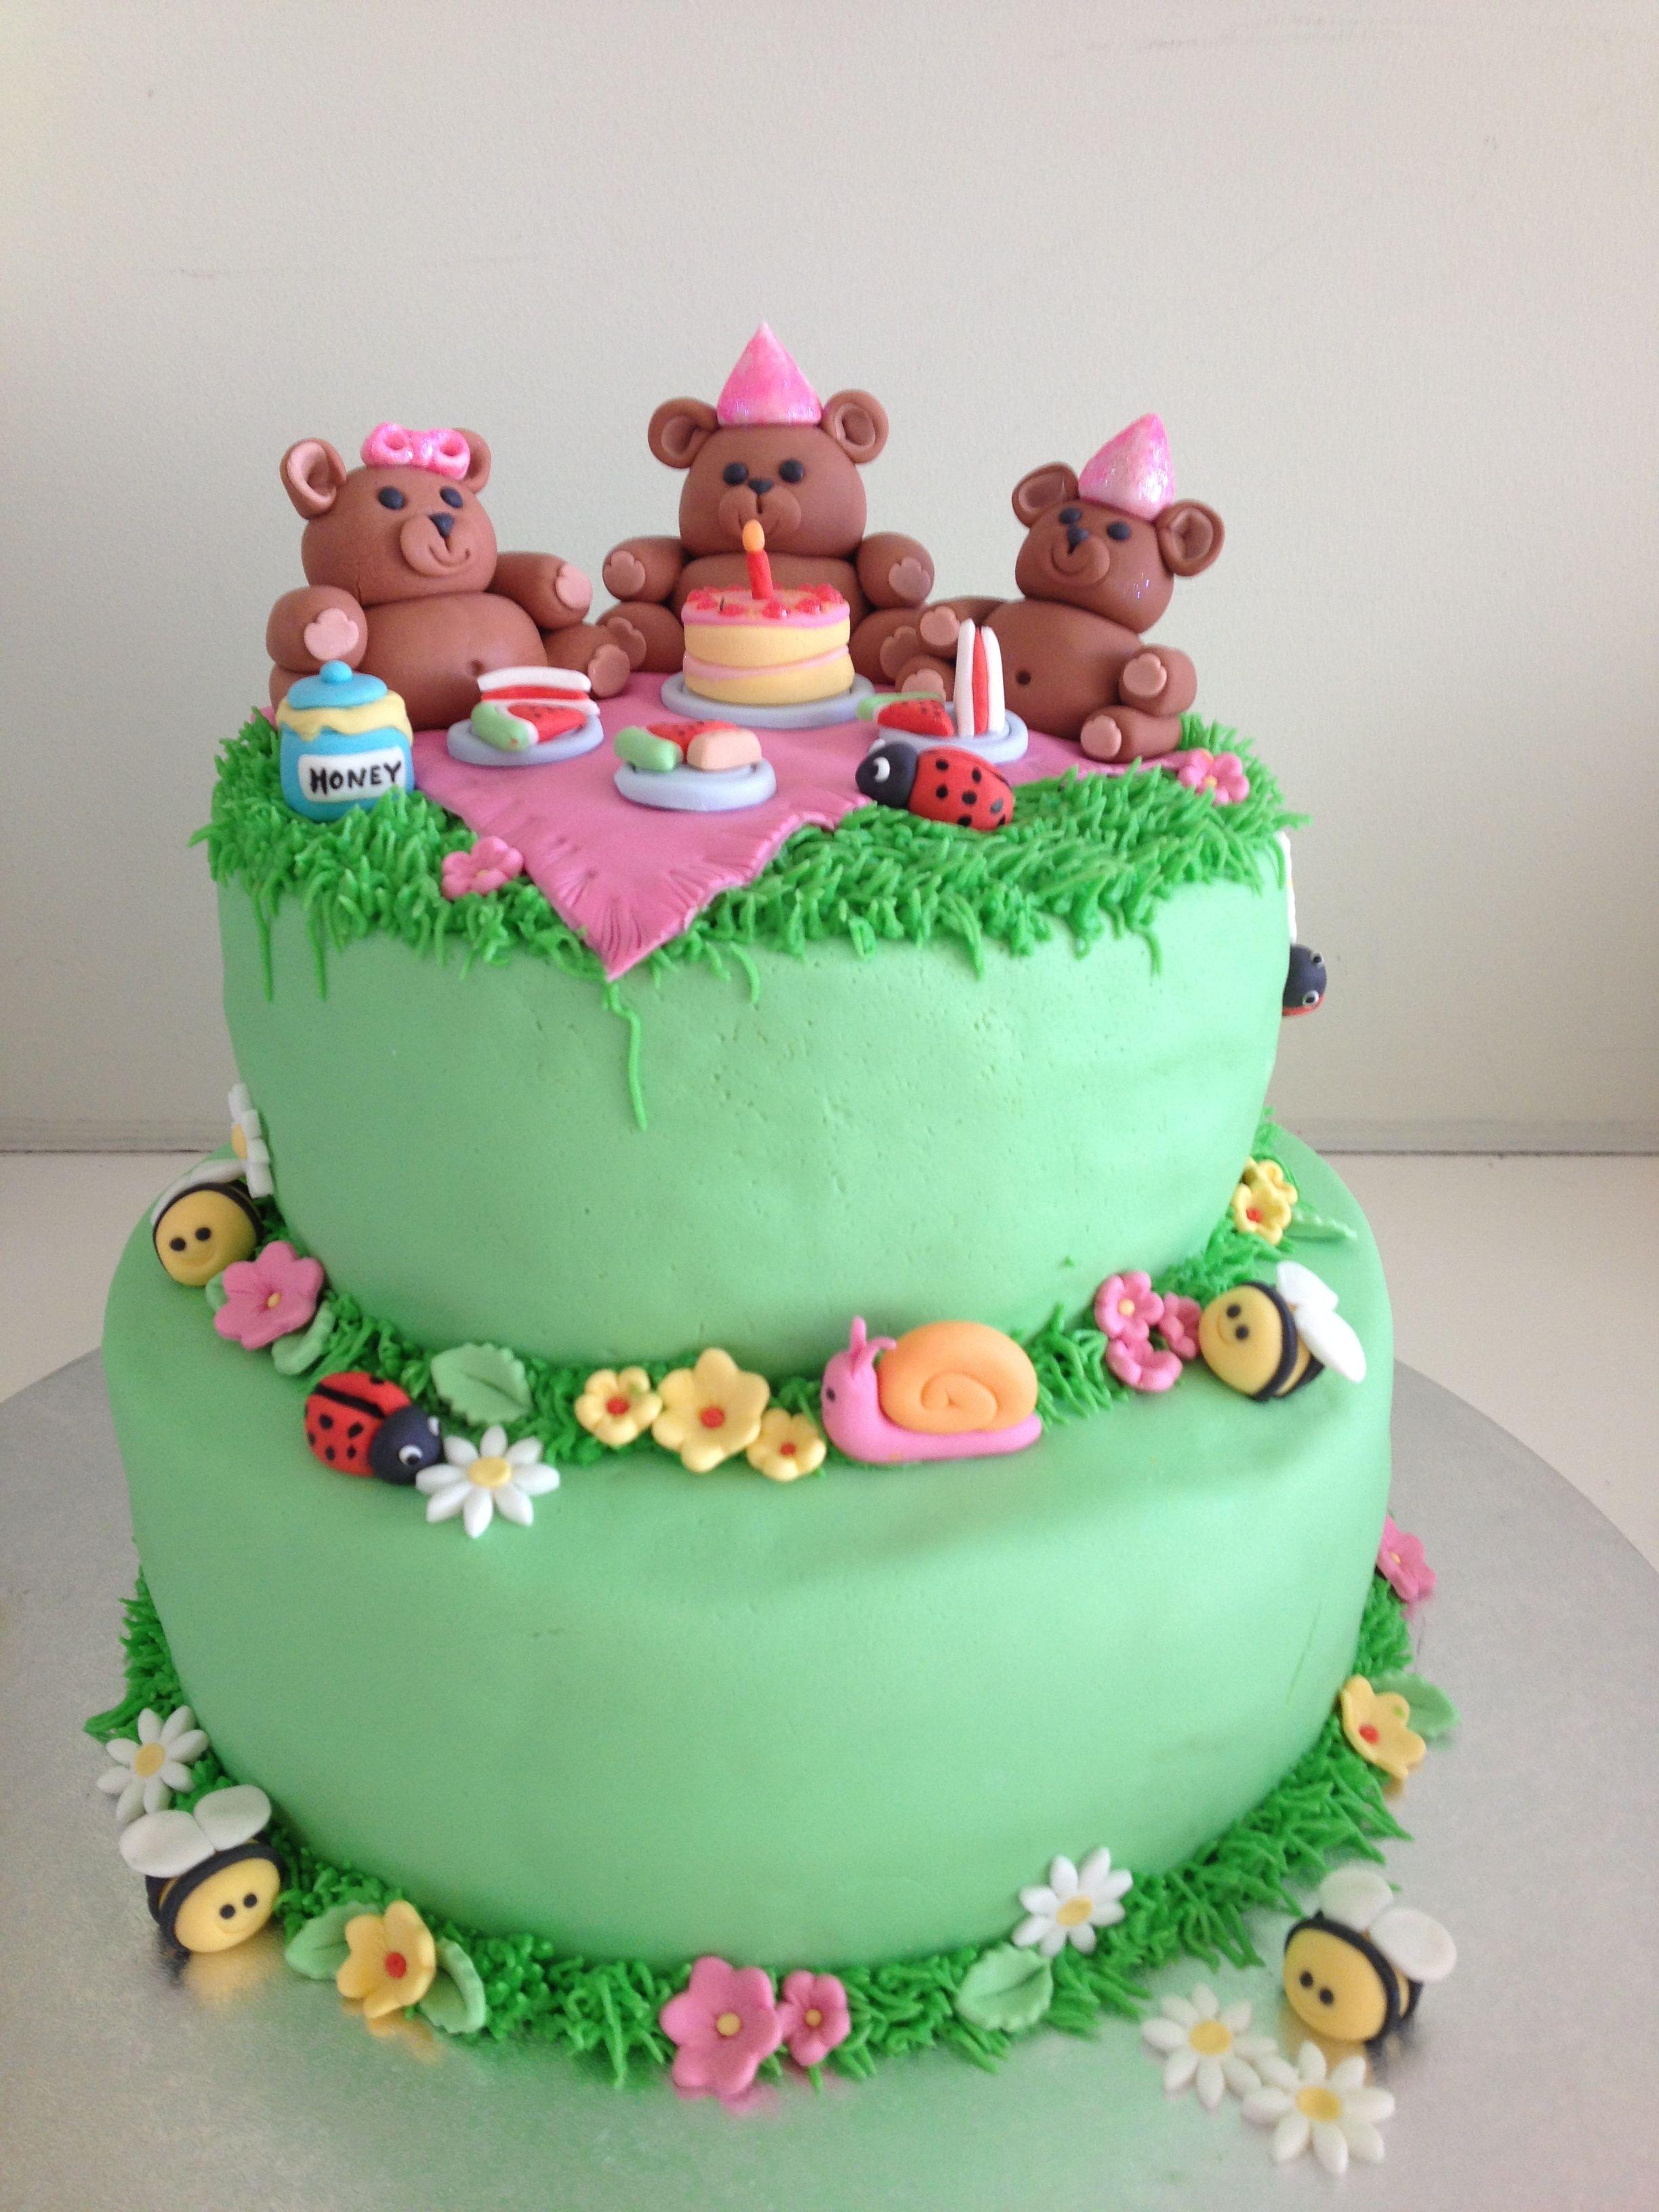 Teddy Bears Picnic Cake Teddybearspicnic Kids Birthday And - Bear birthday cake